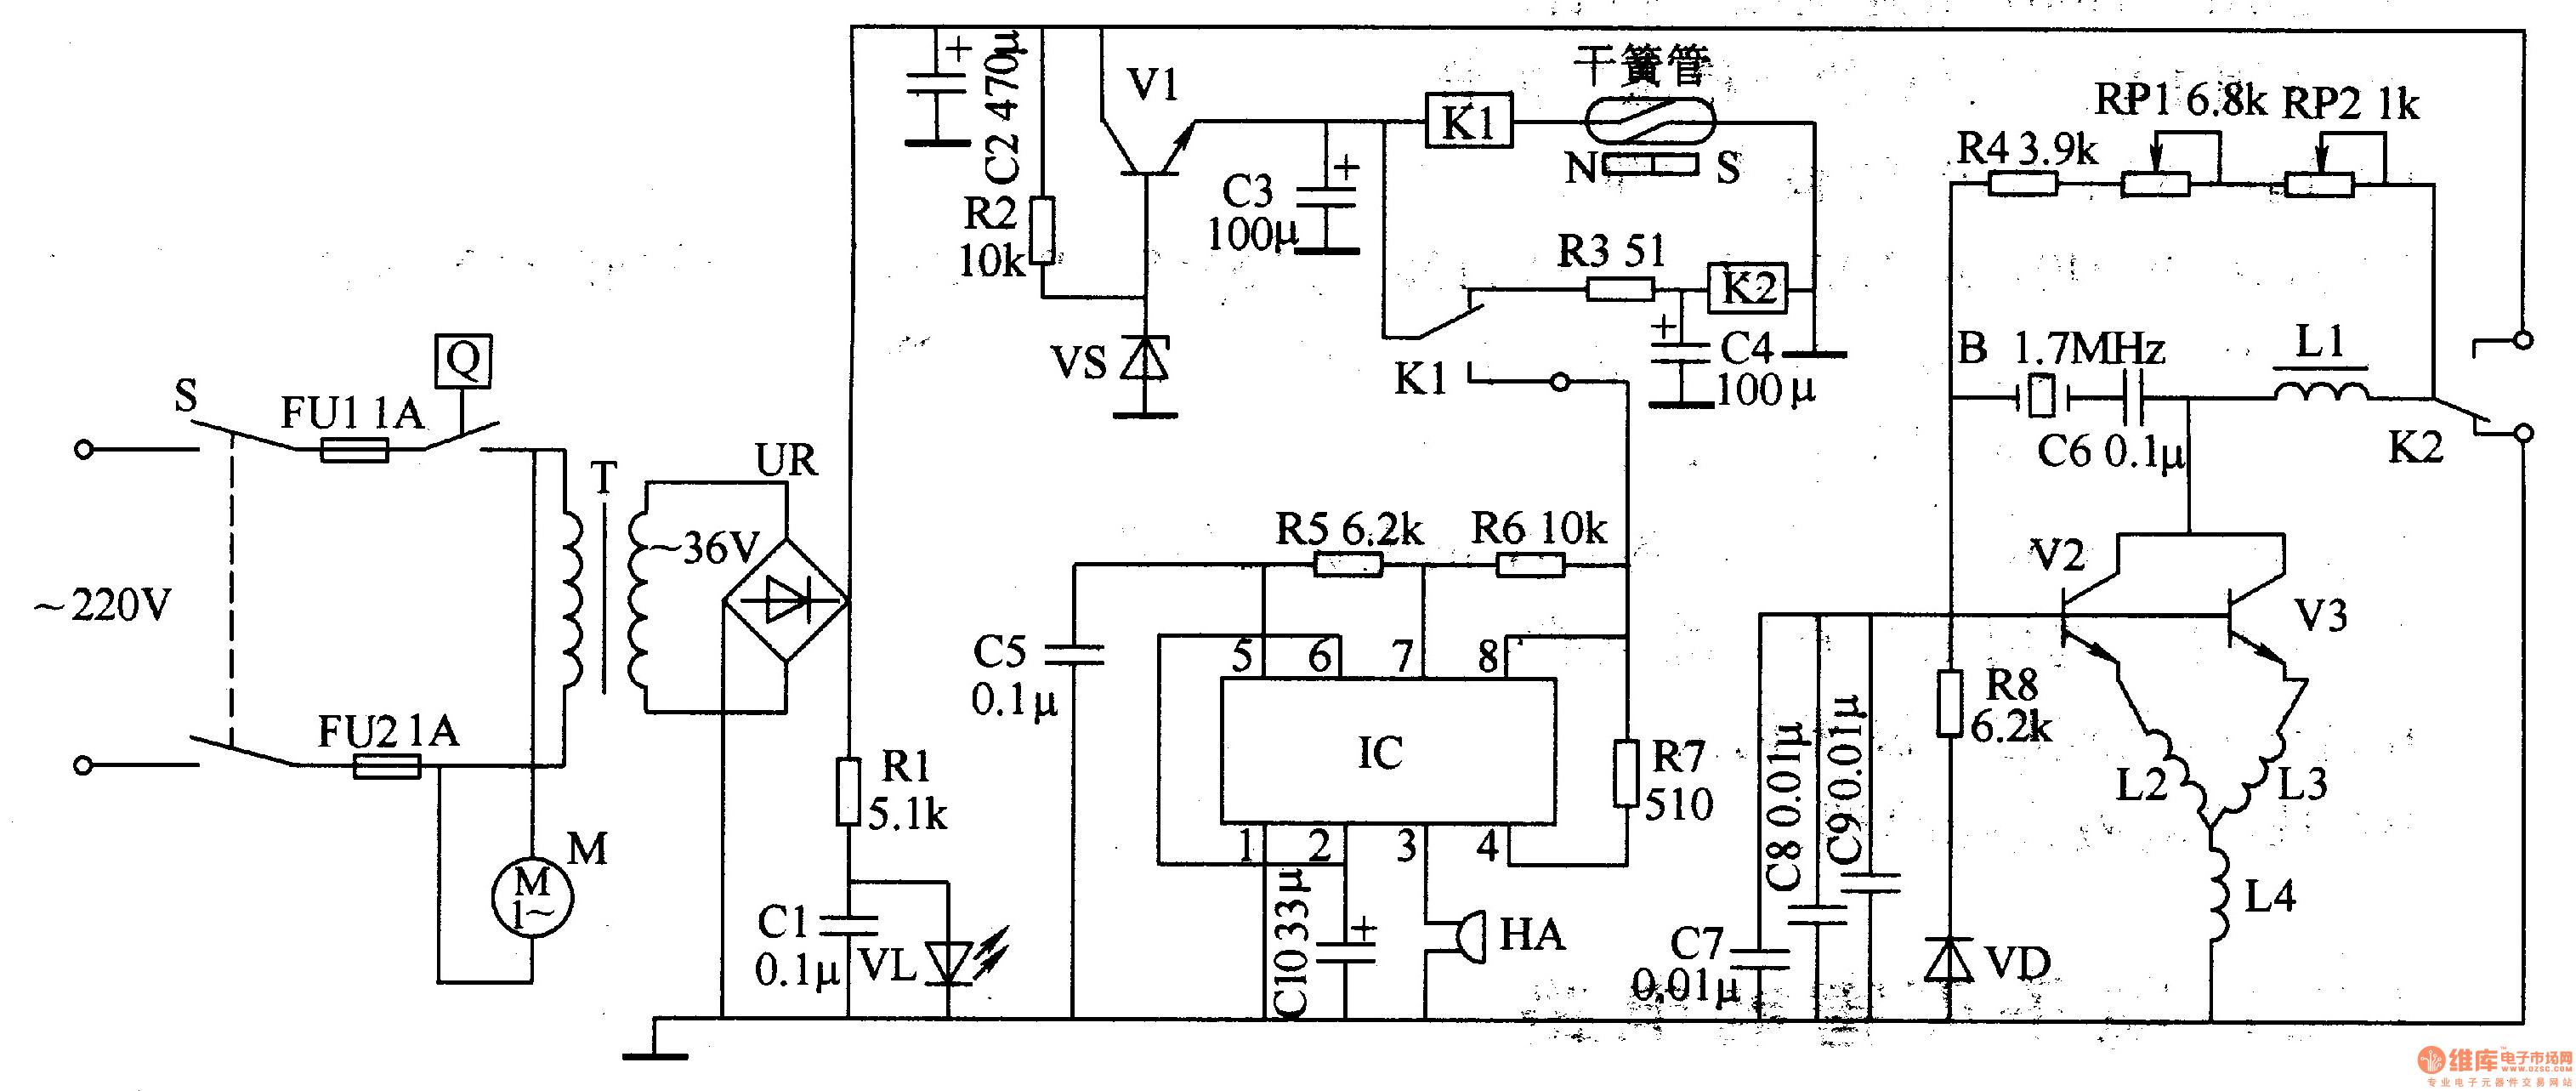 Ultrasonic Atomizer 2 Basic Circuit Diagram Powertooltorquecontrol Controlcircuit Seekic